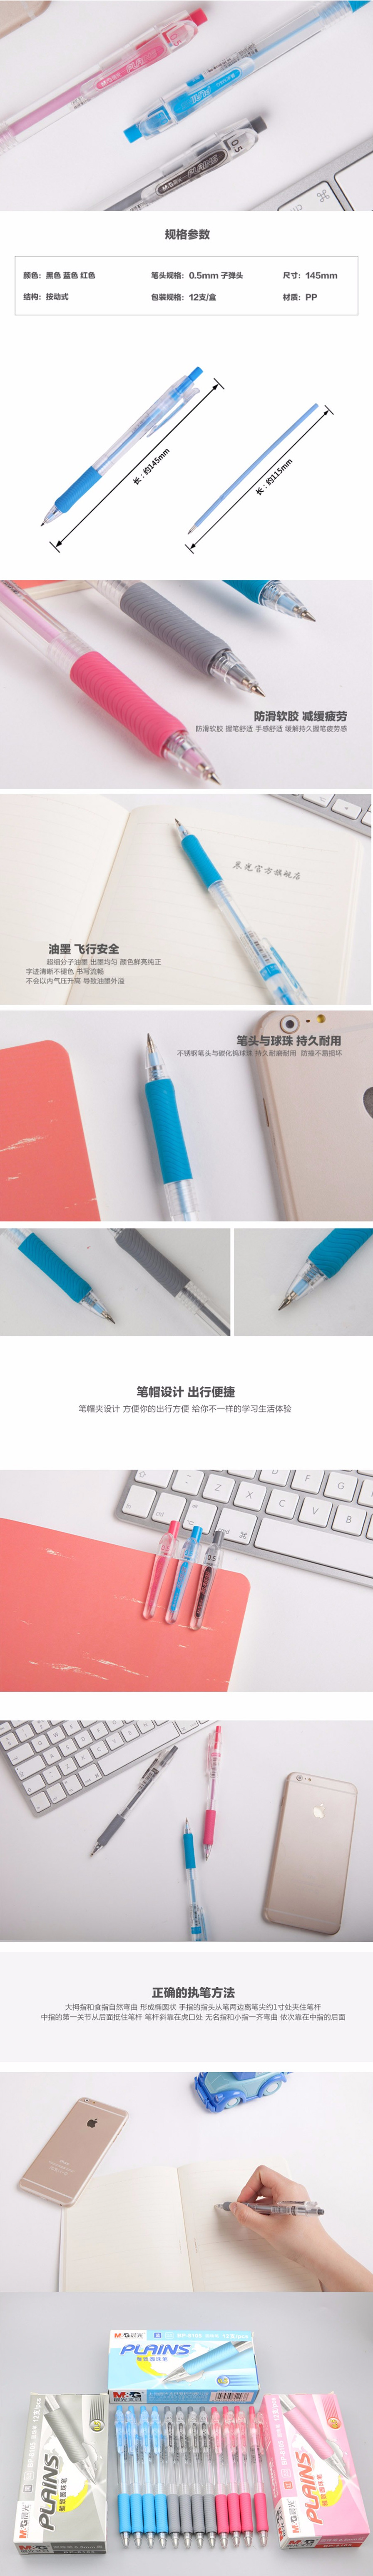 BP-8105-晨光圆珠笔-蓝色